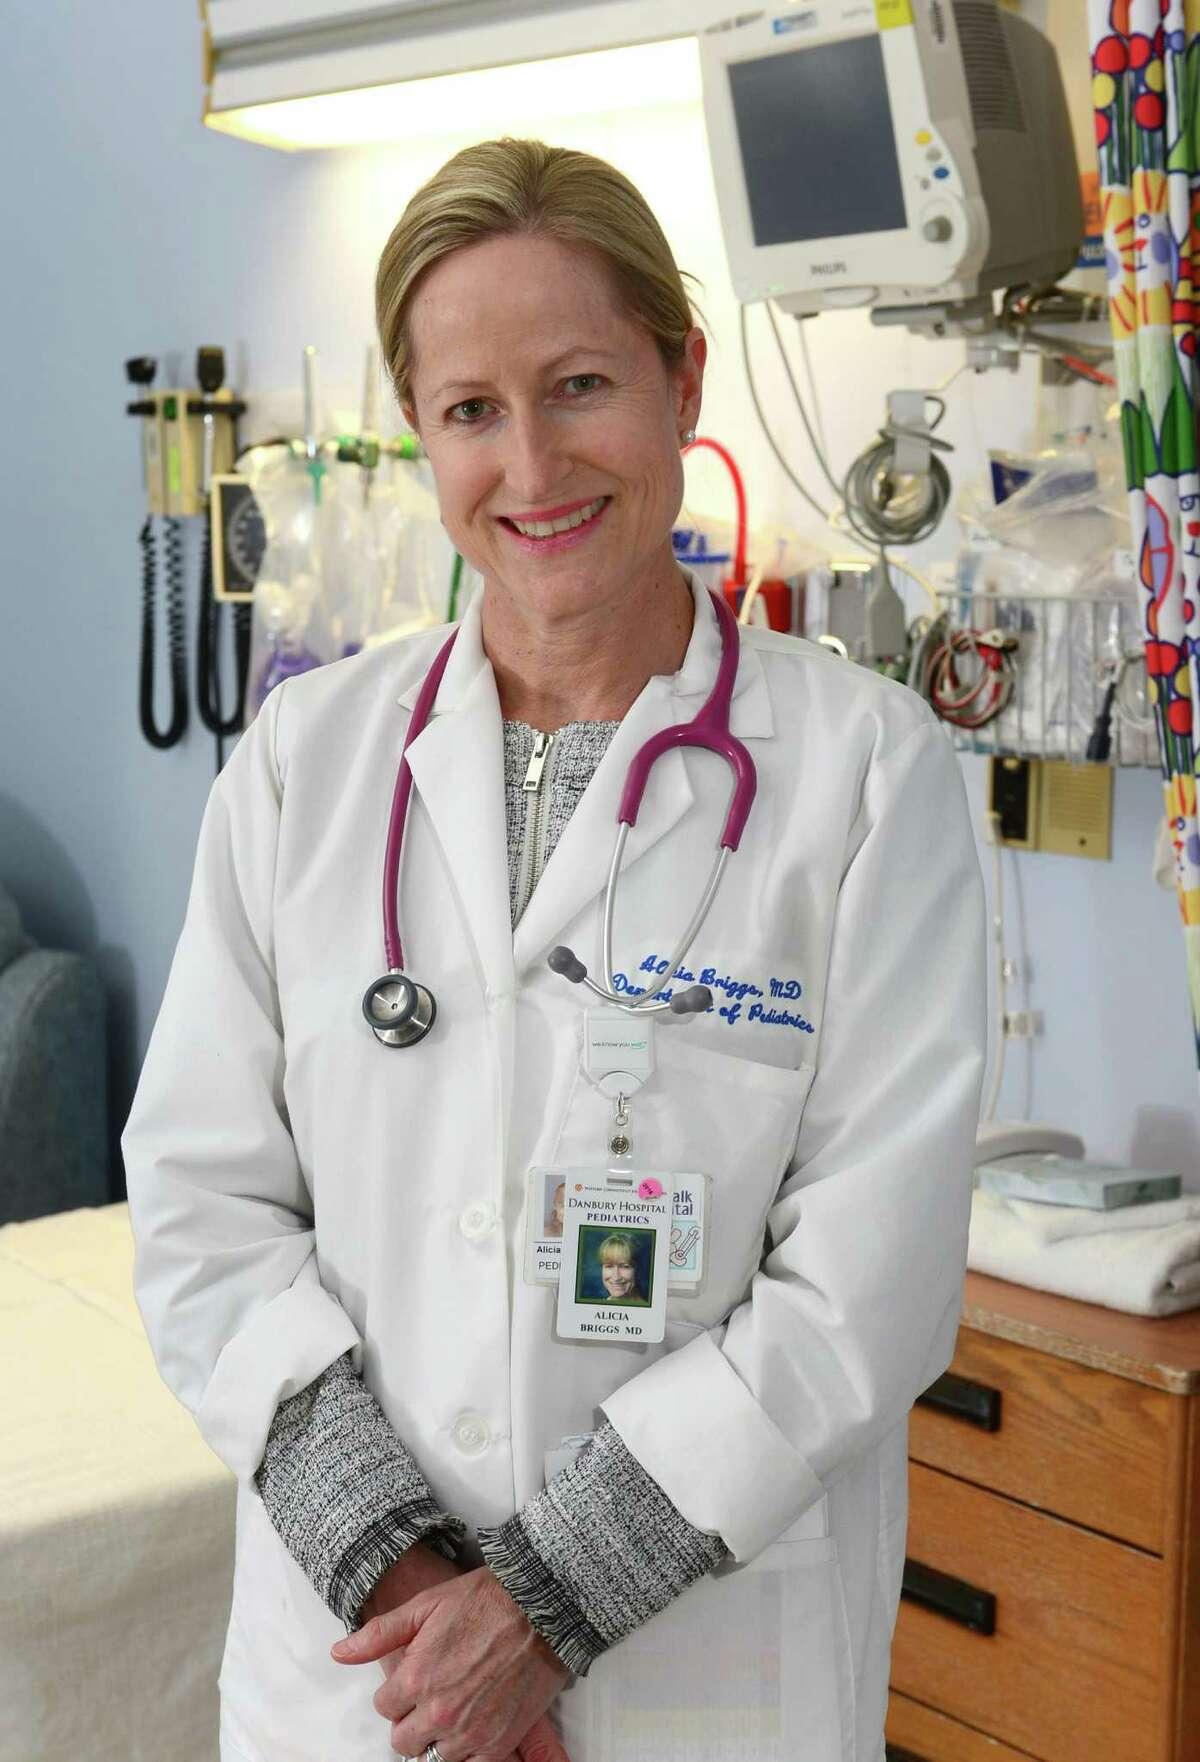 Dr. Alicia Briggs